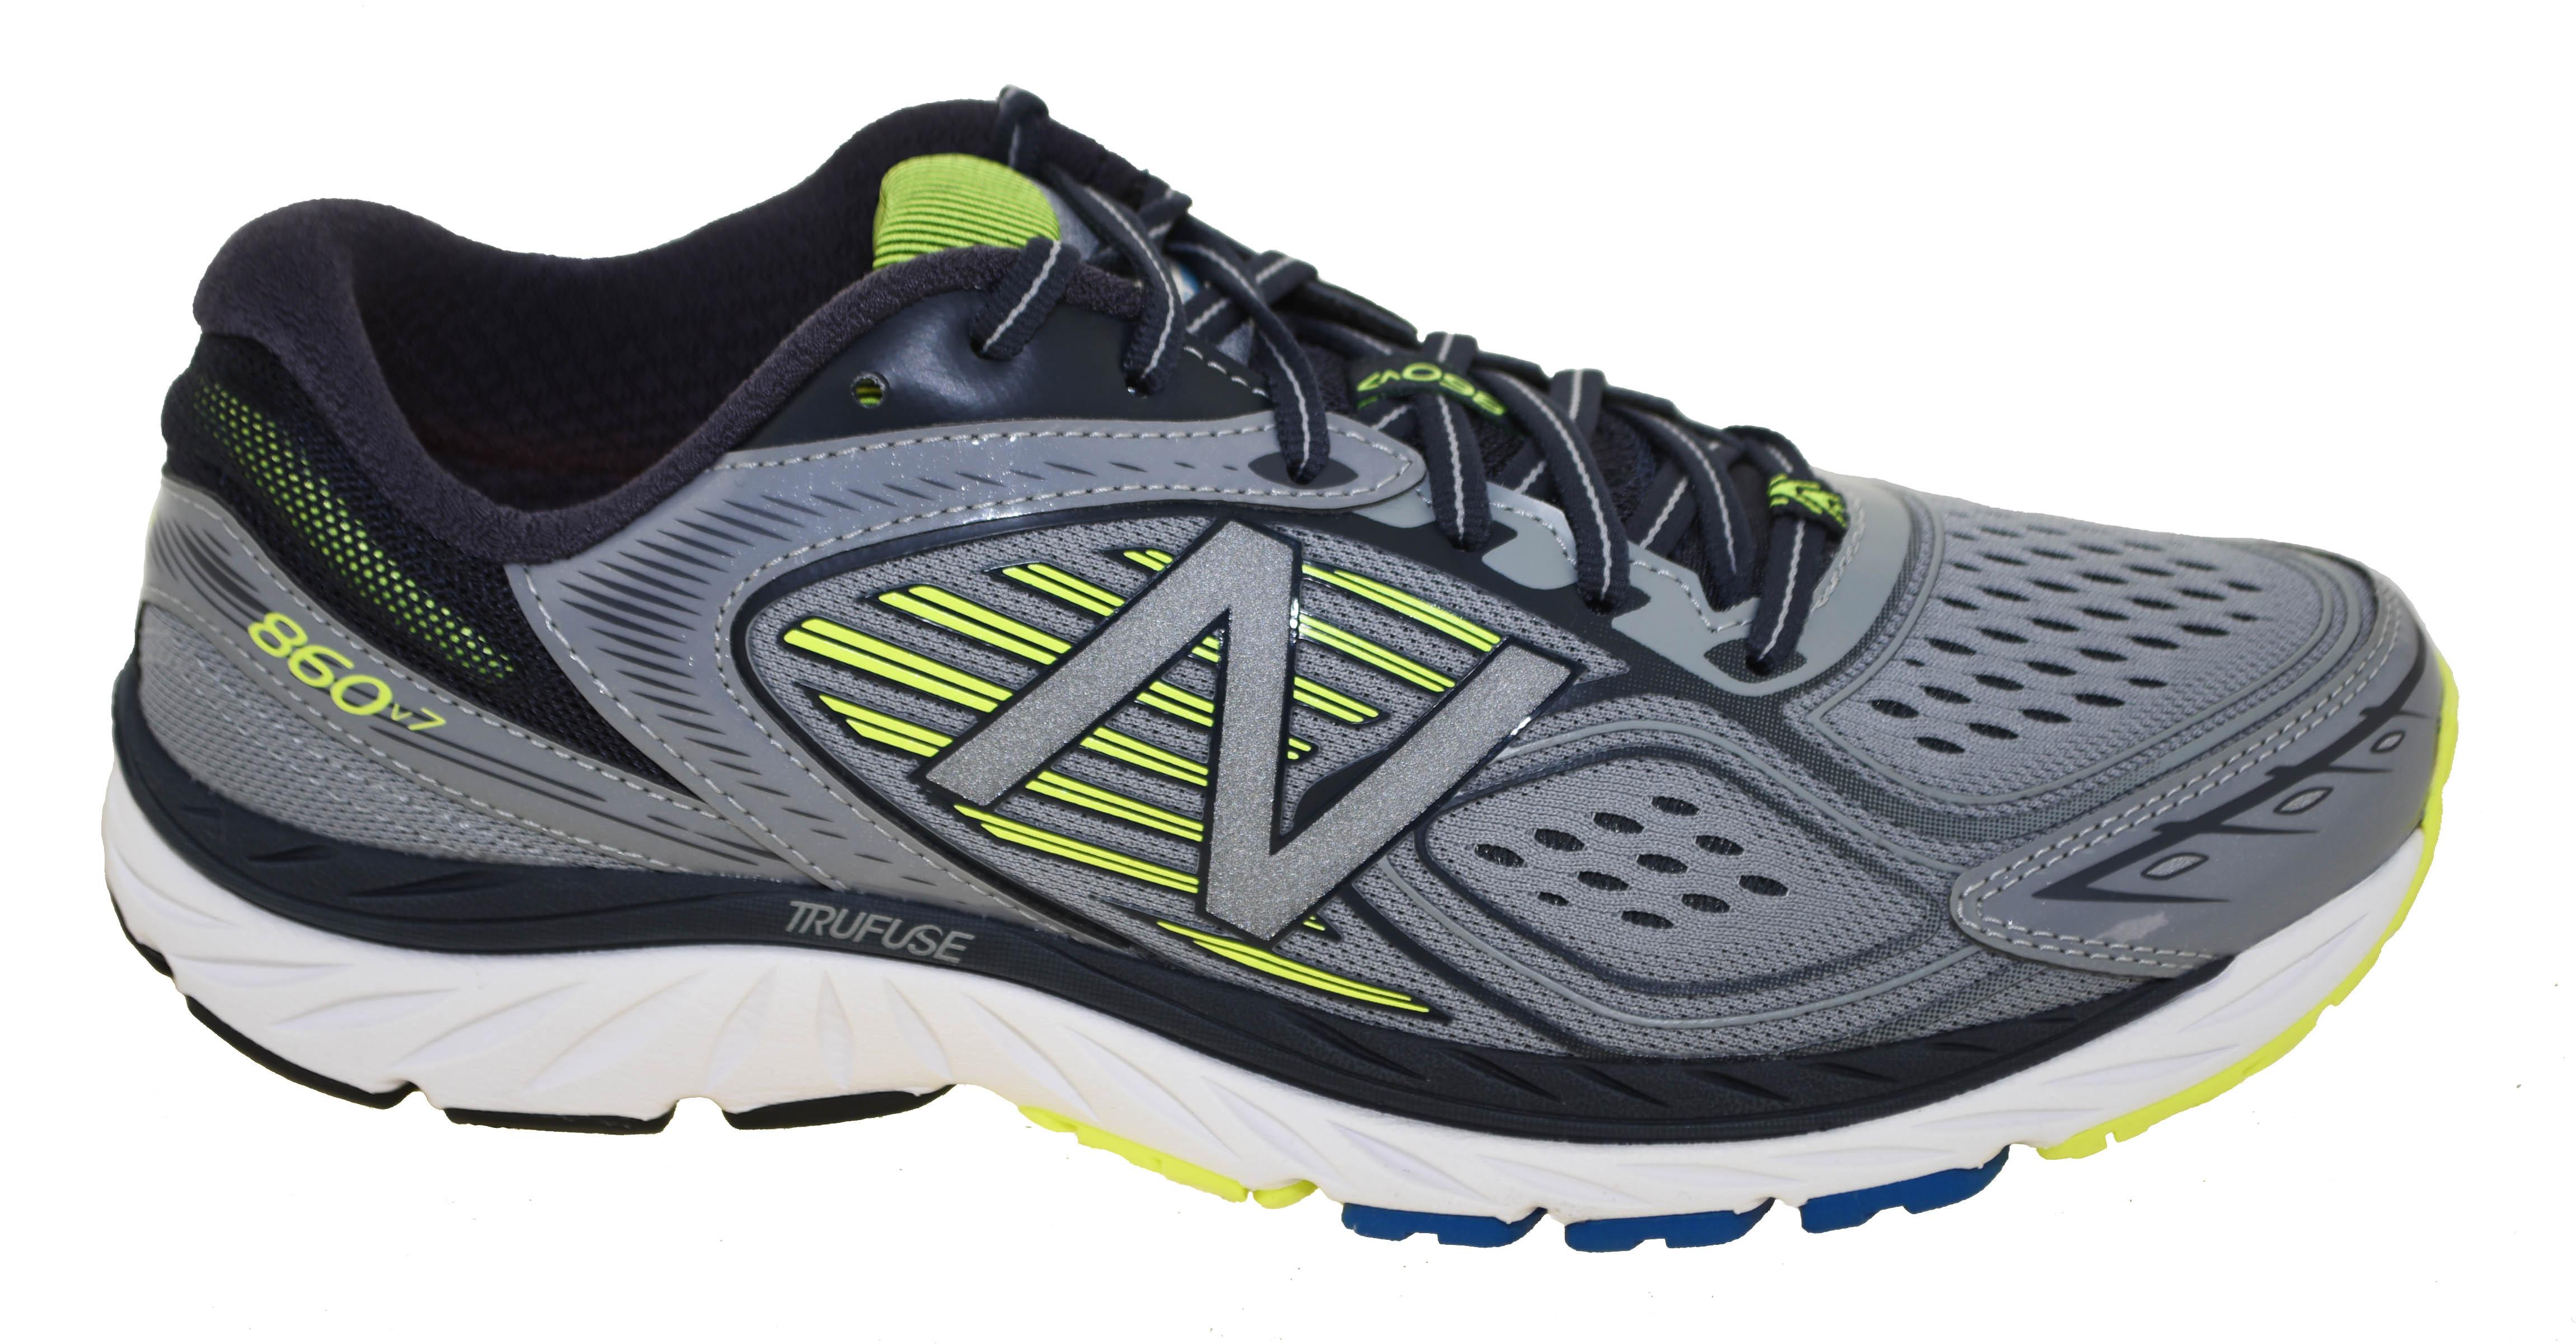 New Balance 860 v9 2E Wide Fit Men's Running Shoe | The